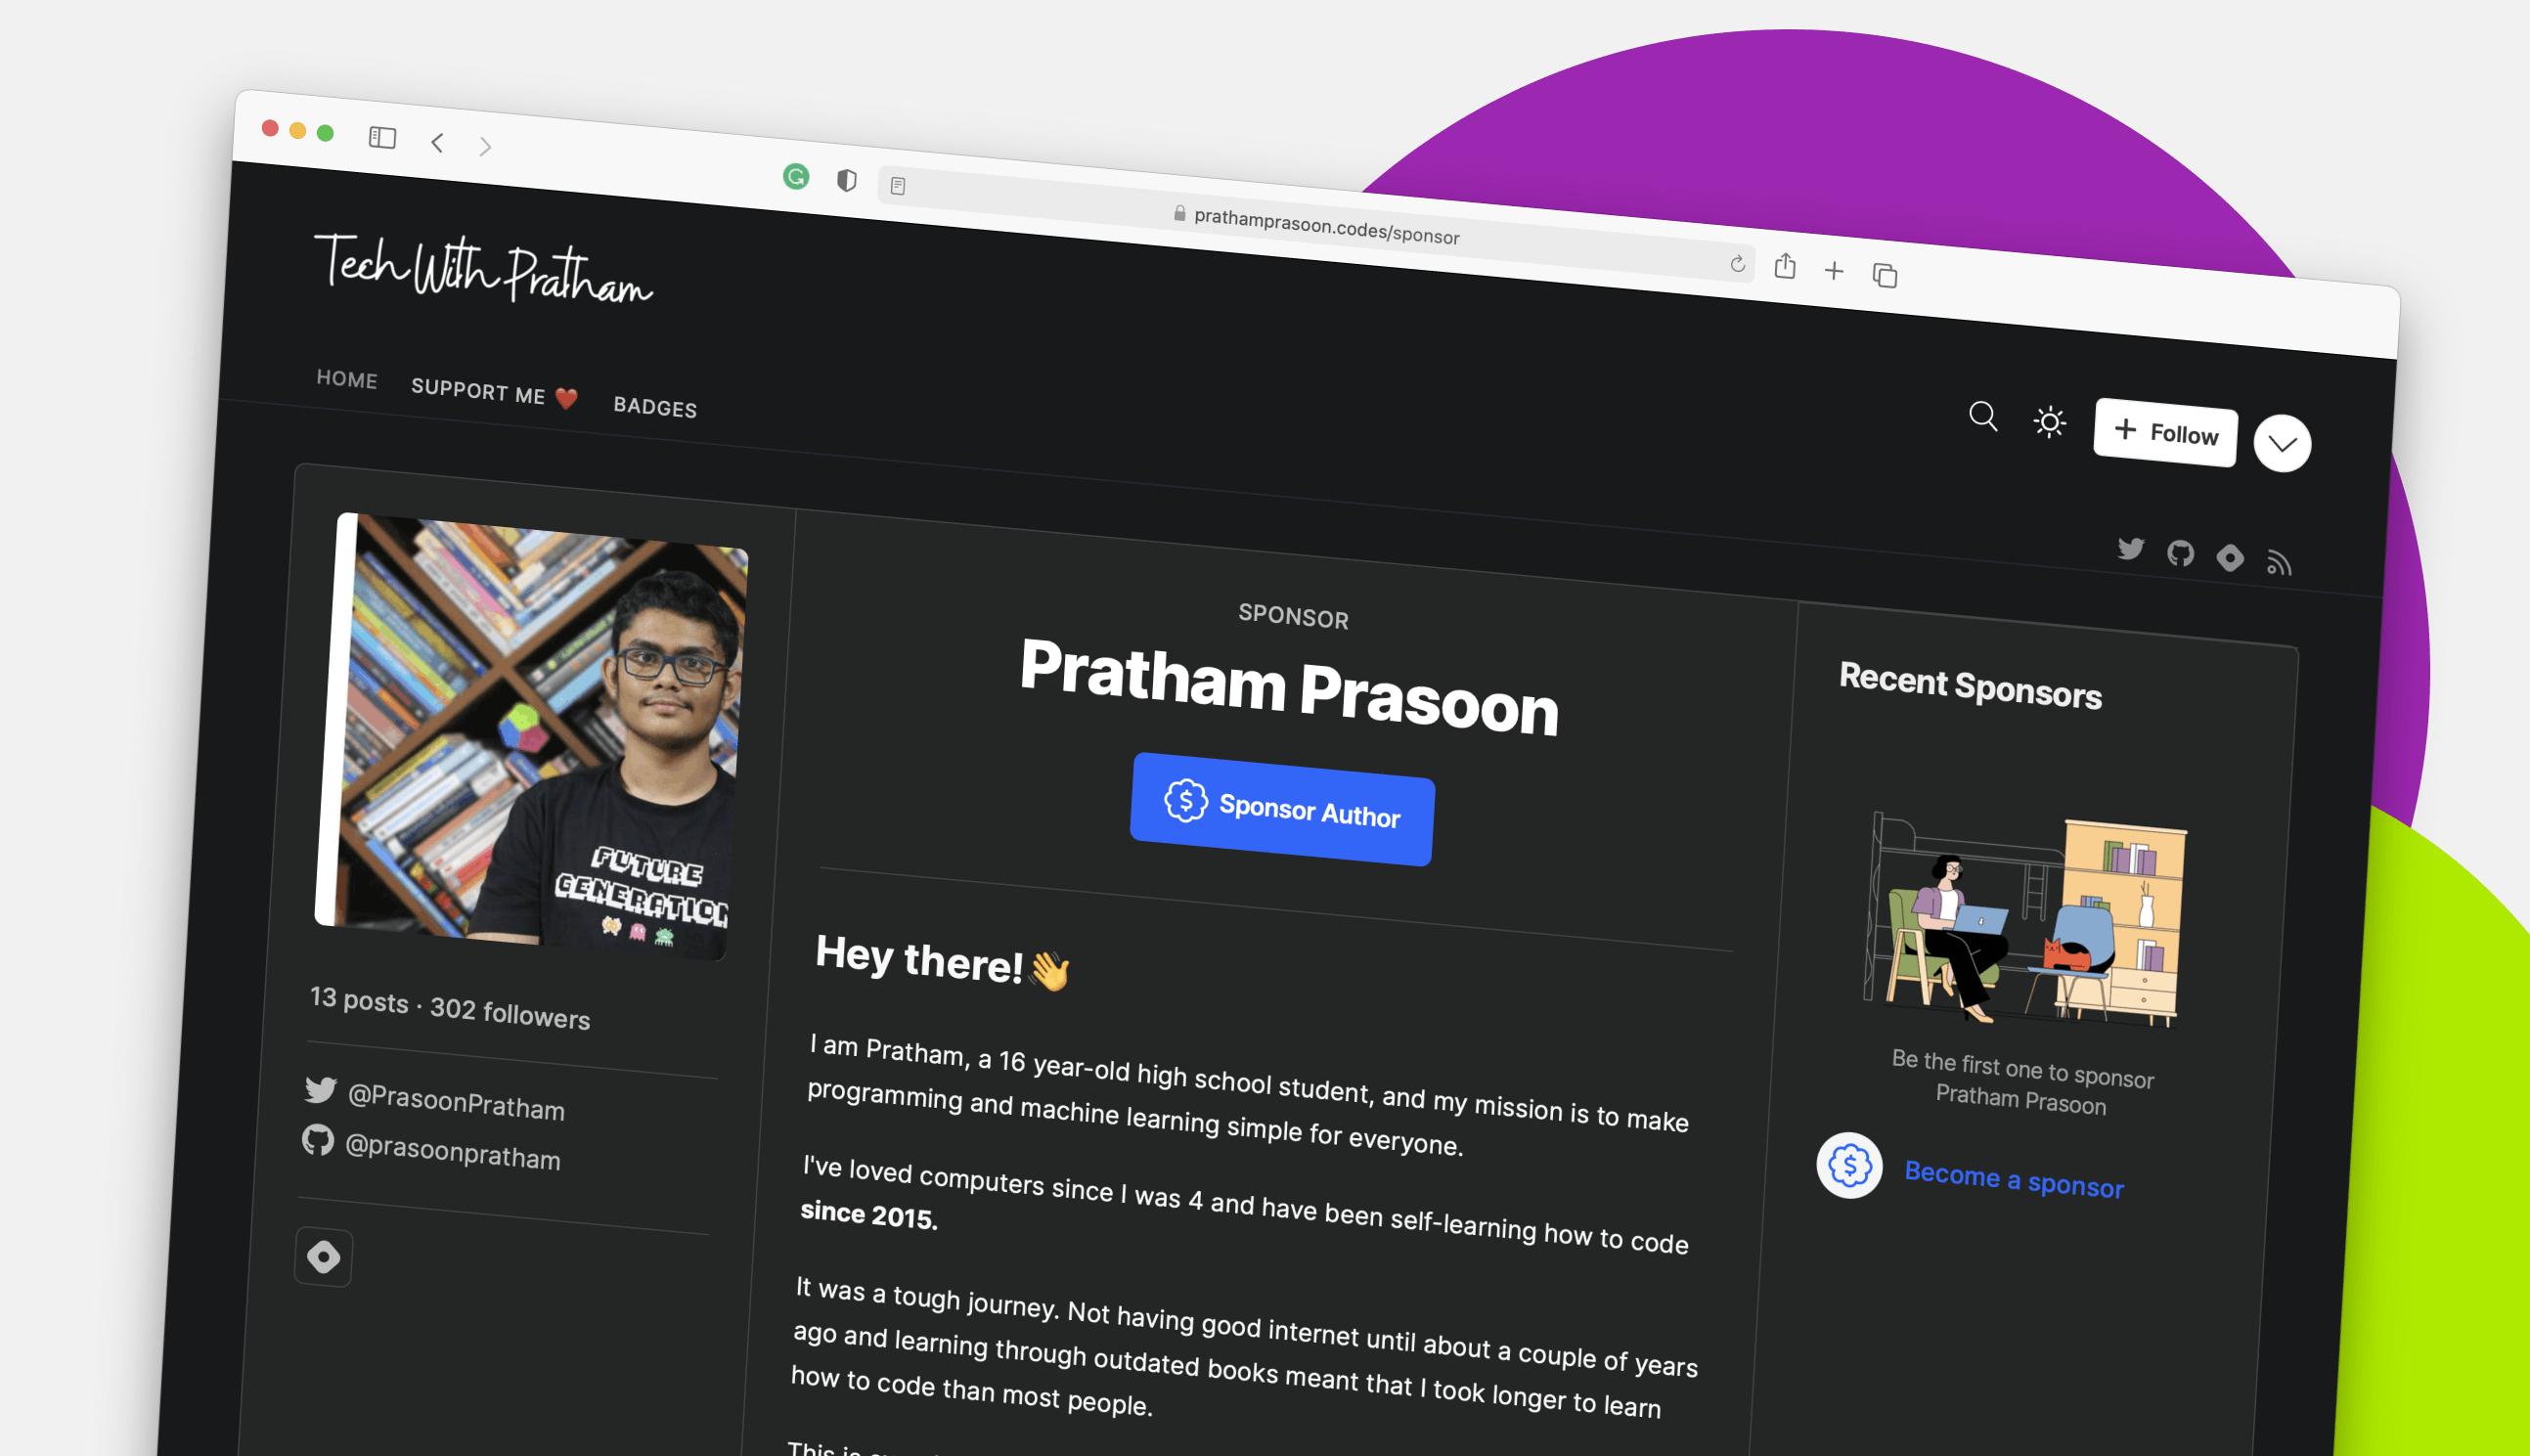 Blog by Pratham Prasoon